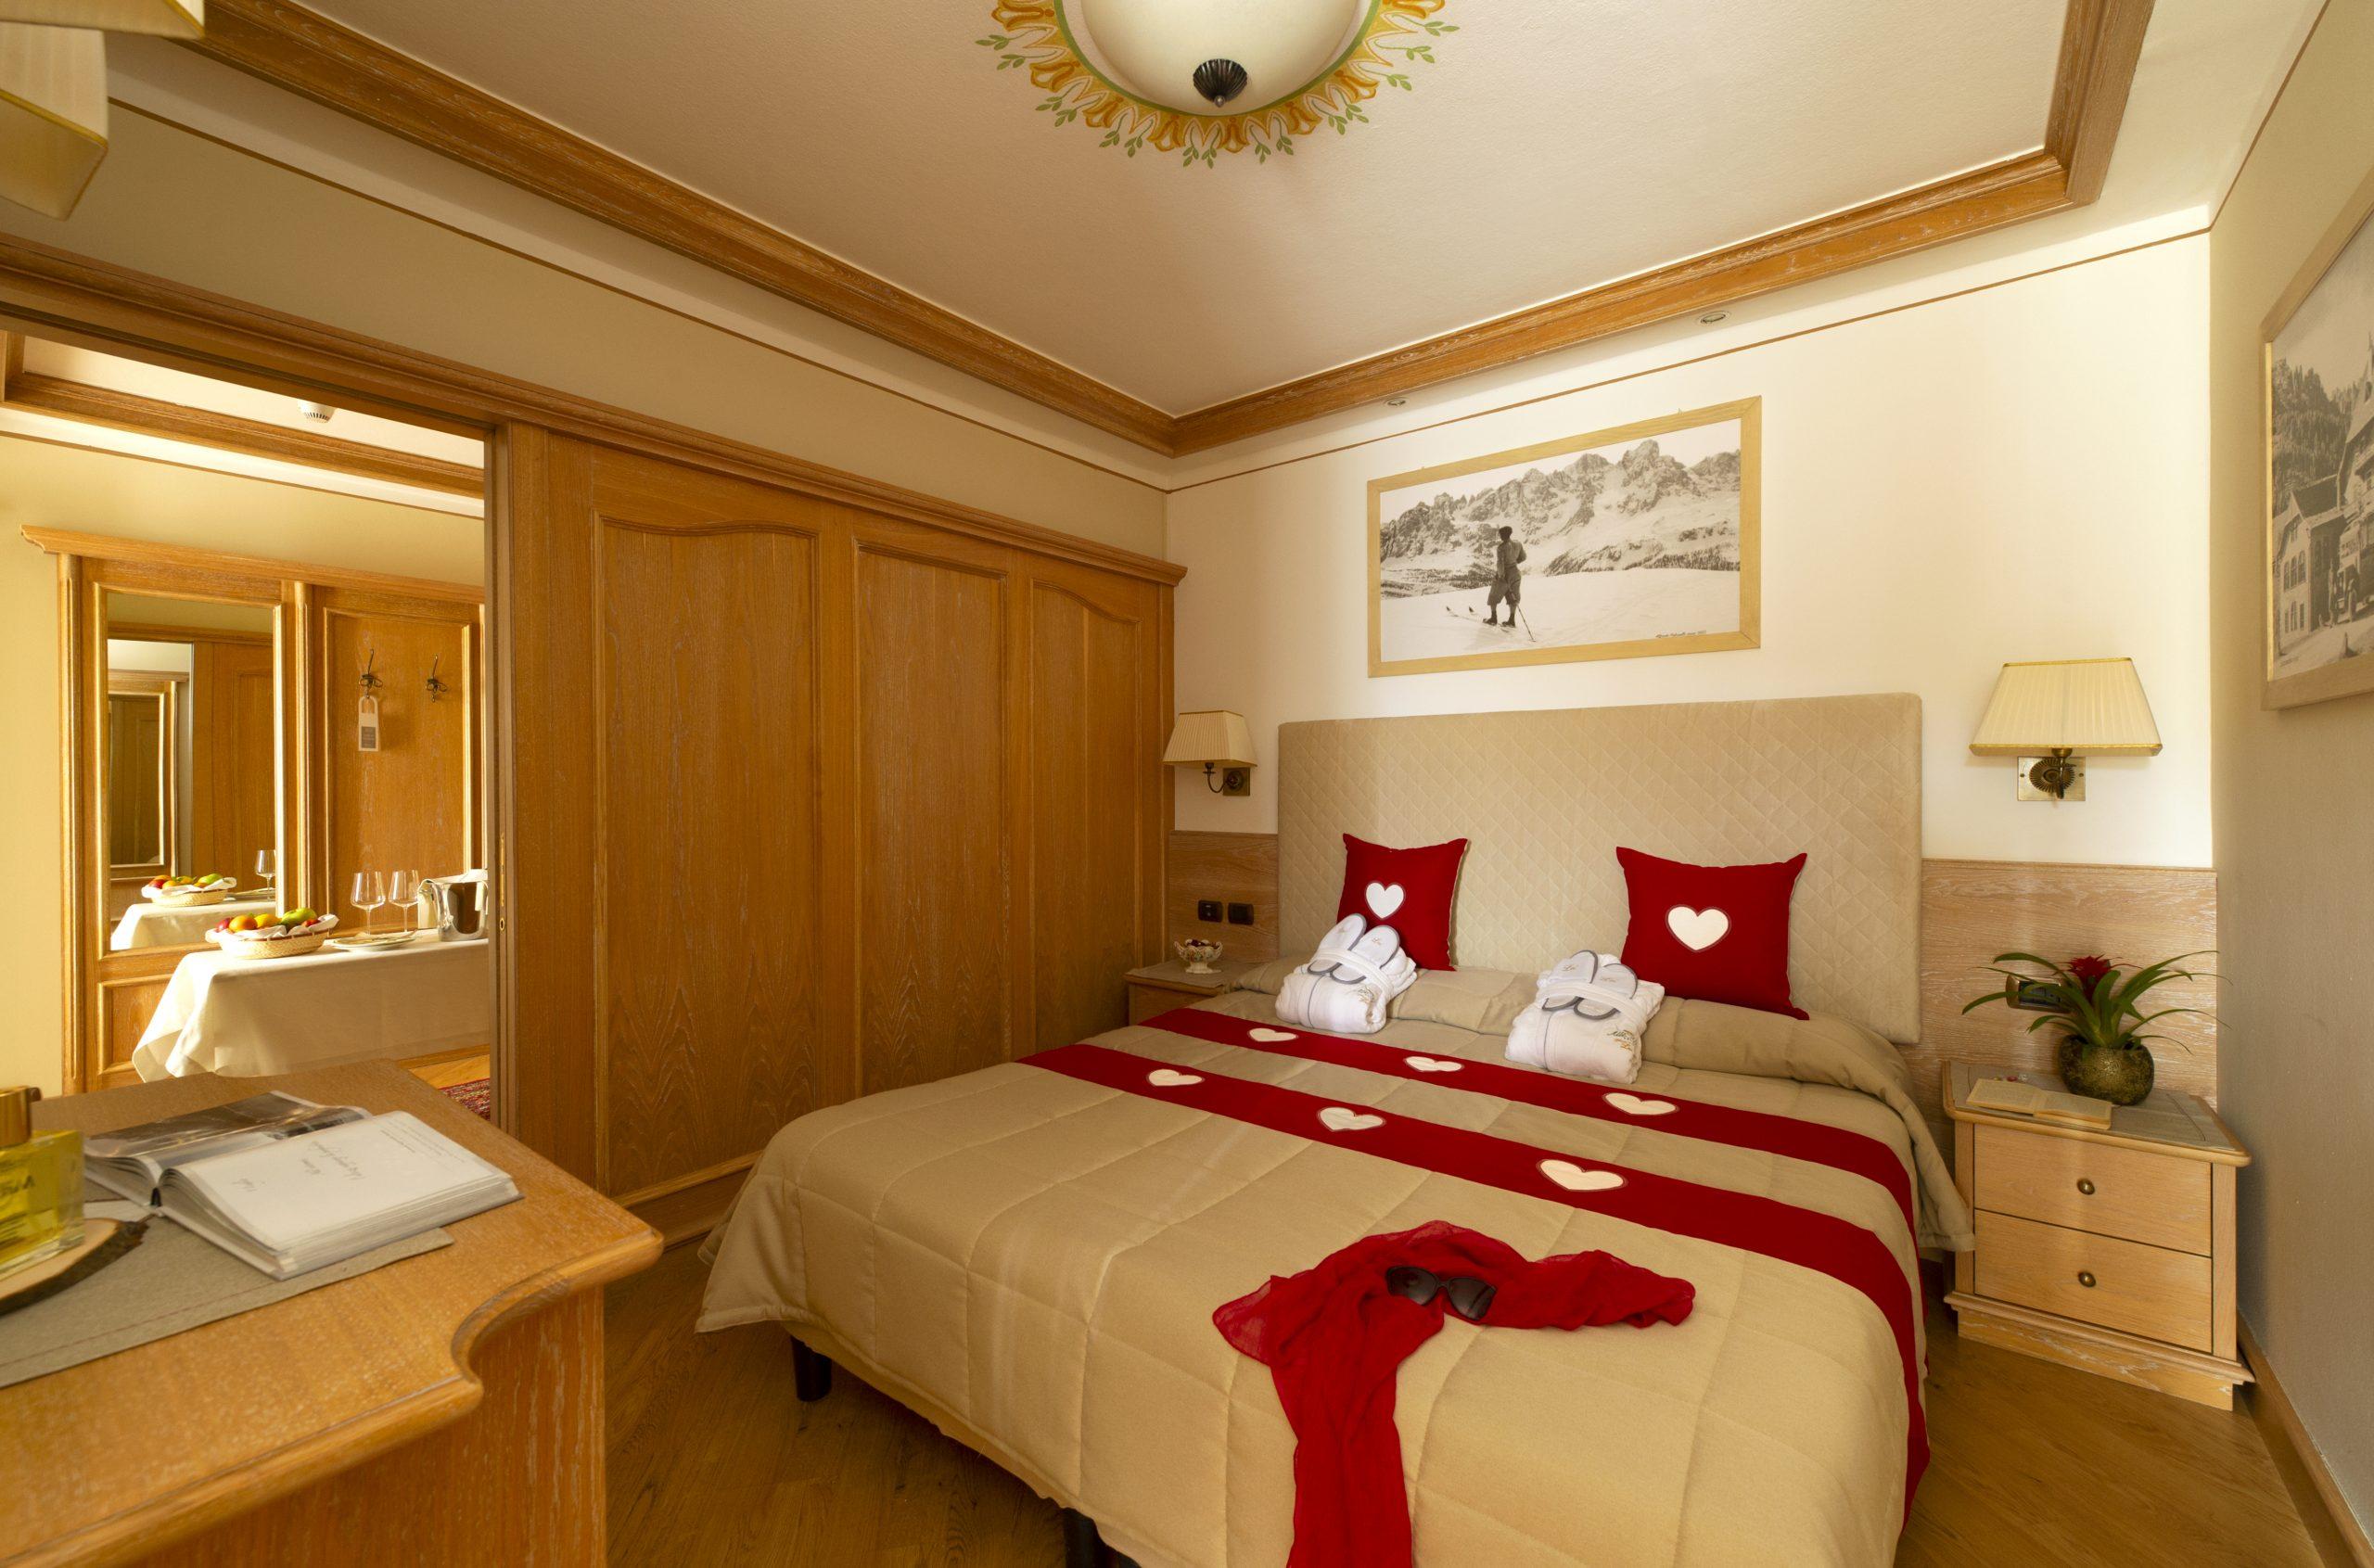 1_suite_relax_camera_ambienti_hotel_alle_alpi_moena_val_di_fassa